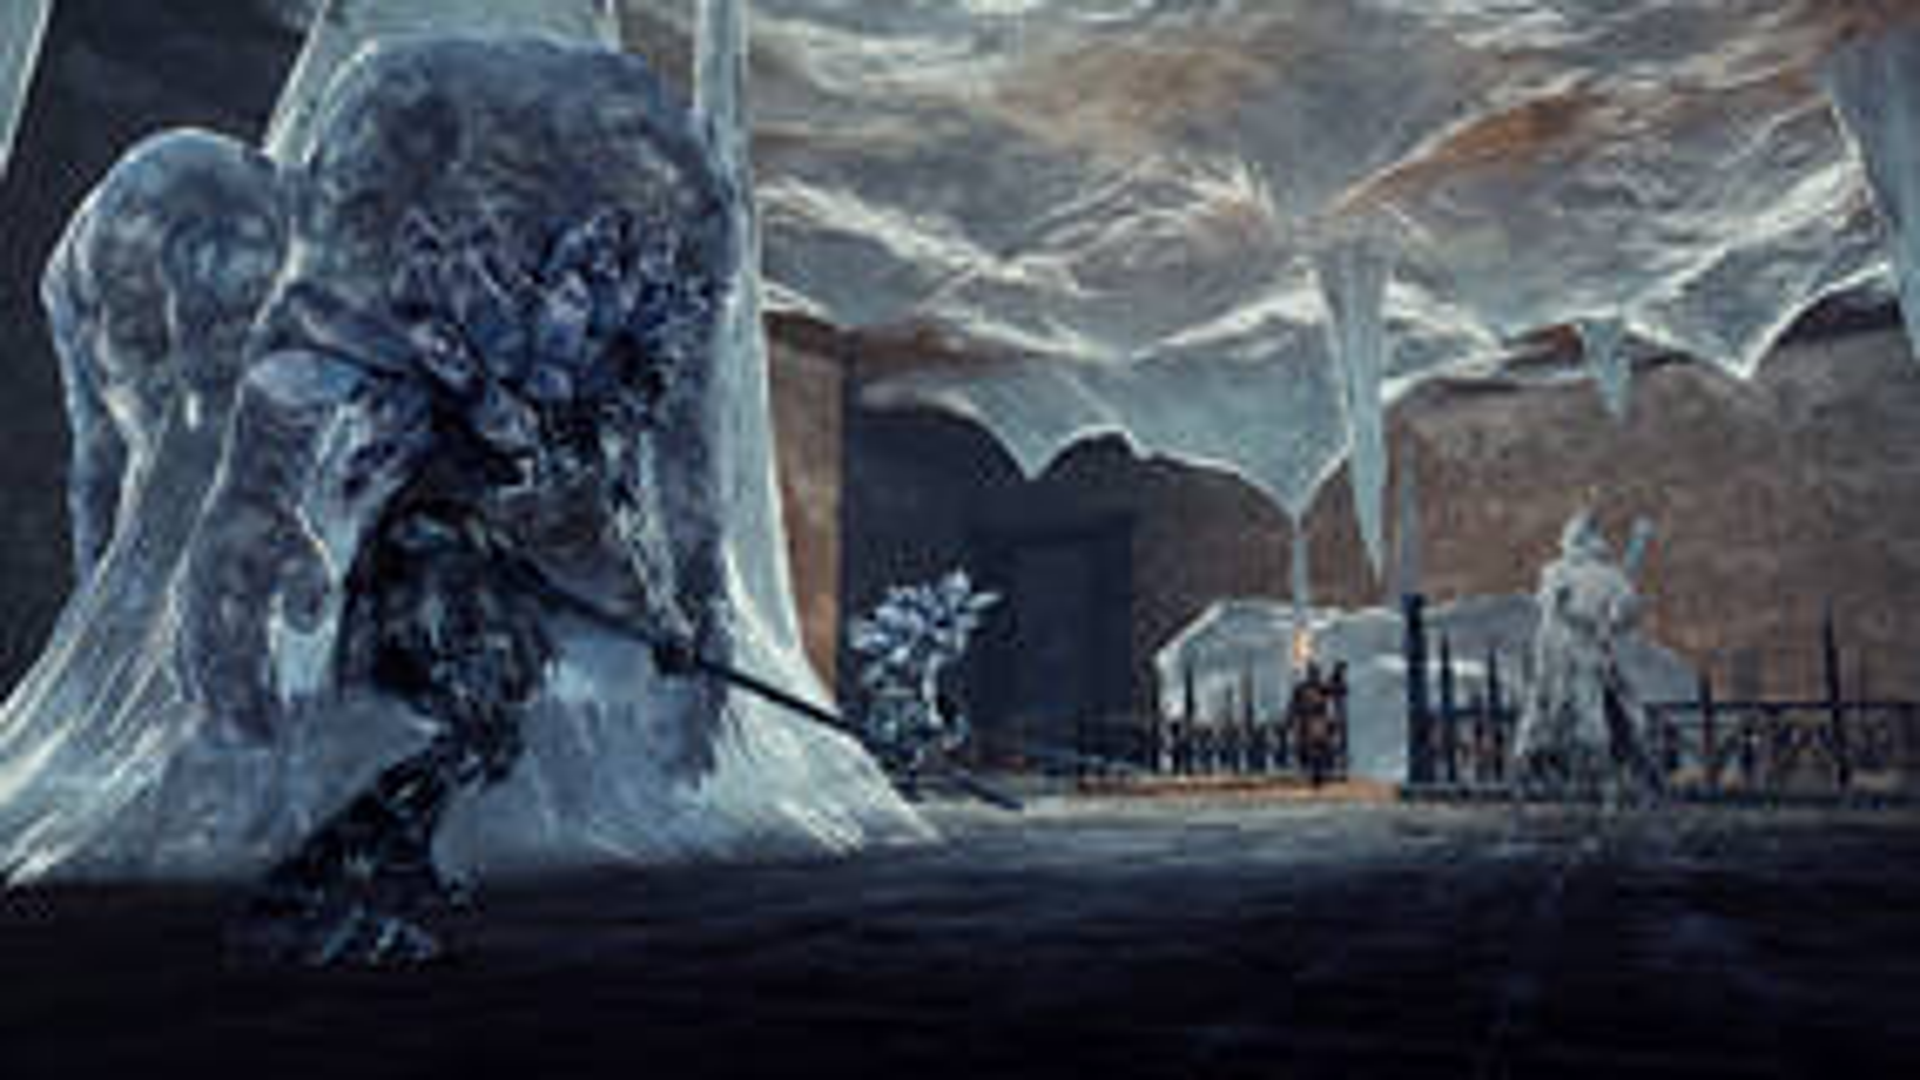 Image for Dark Souls 2 guide: Crown of the Ivory King - Burnt Ivory King boss battle